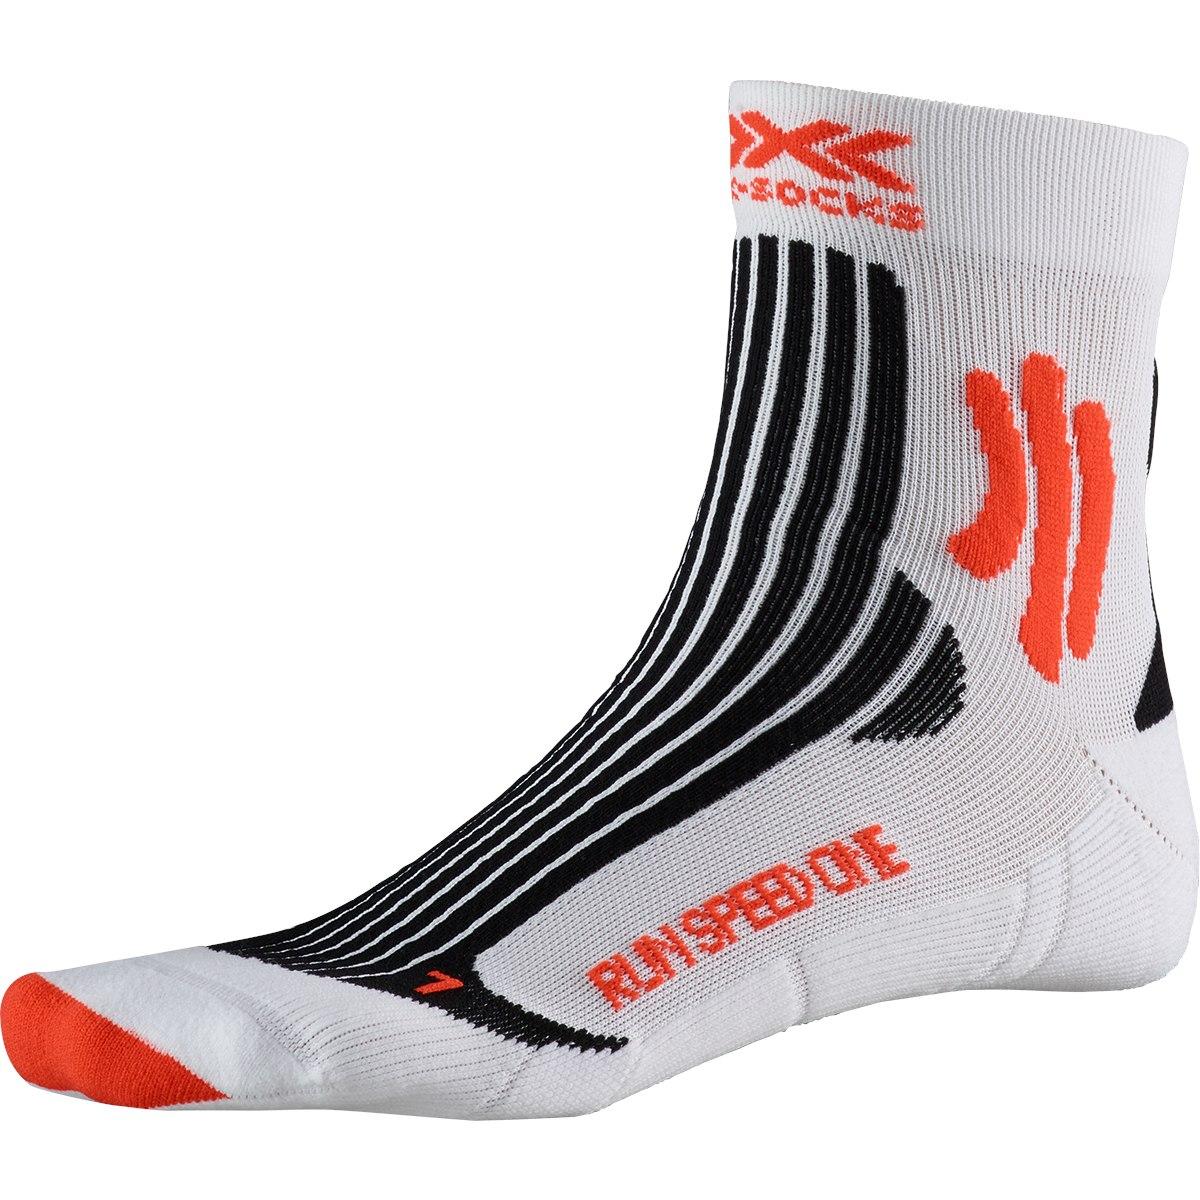 X-Socks Run Speed One Laufsocken - white/sunset orange